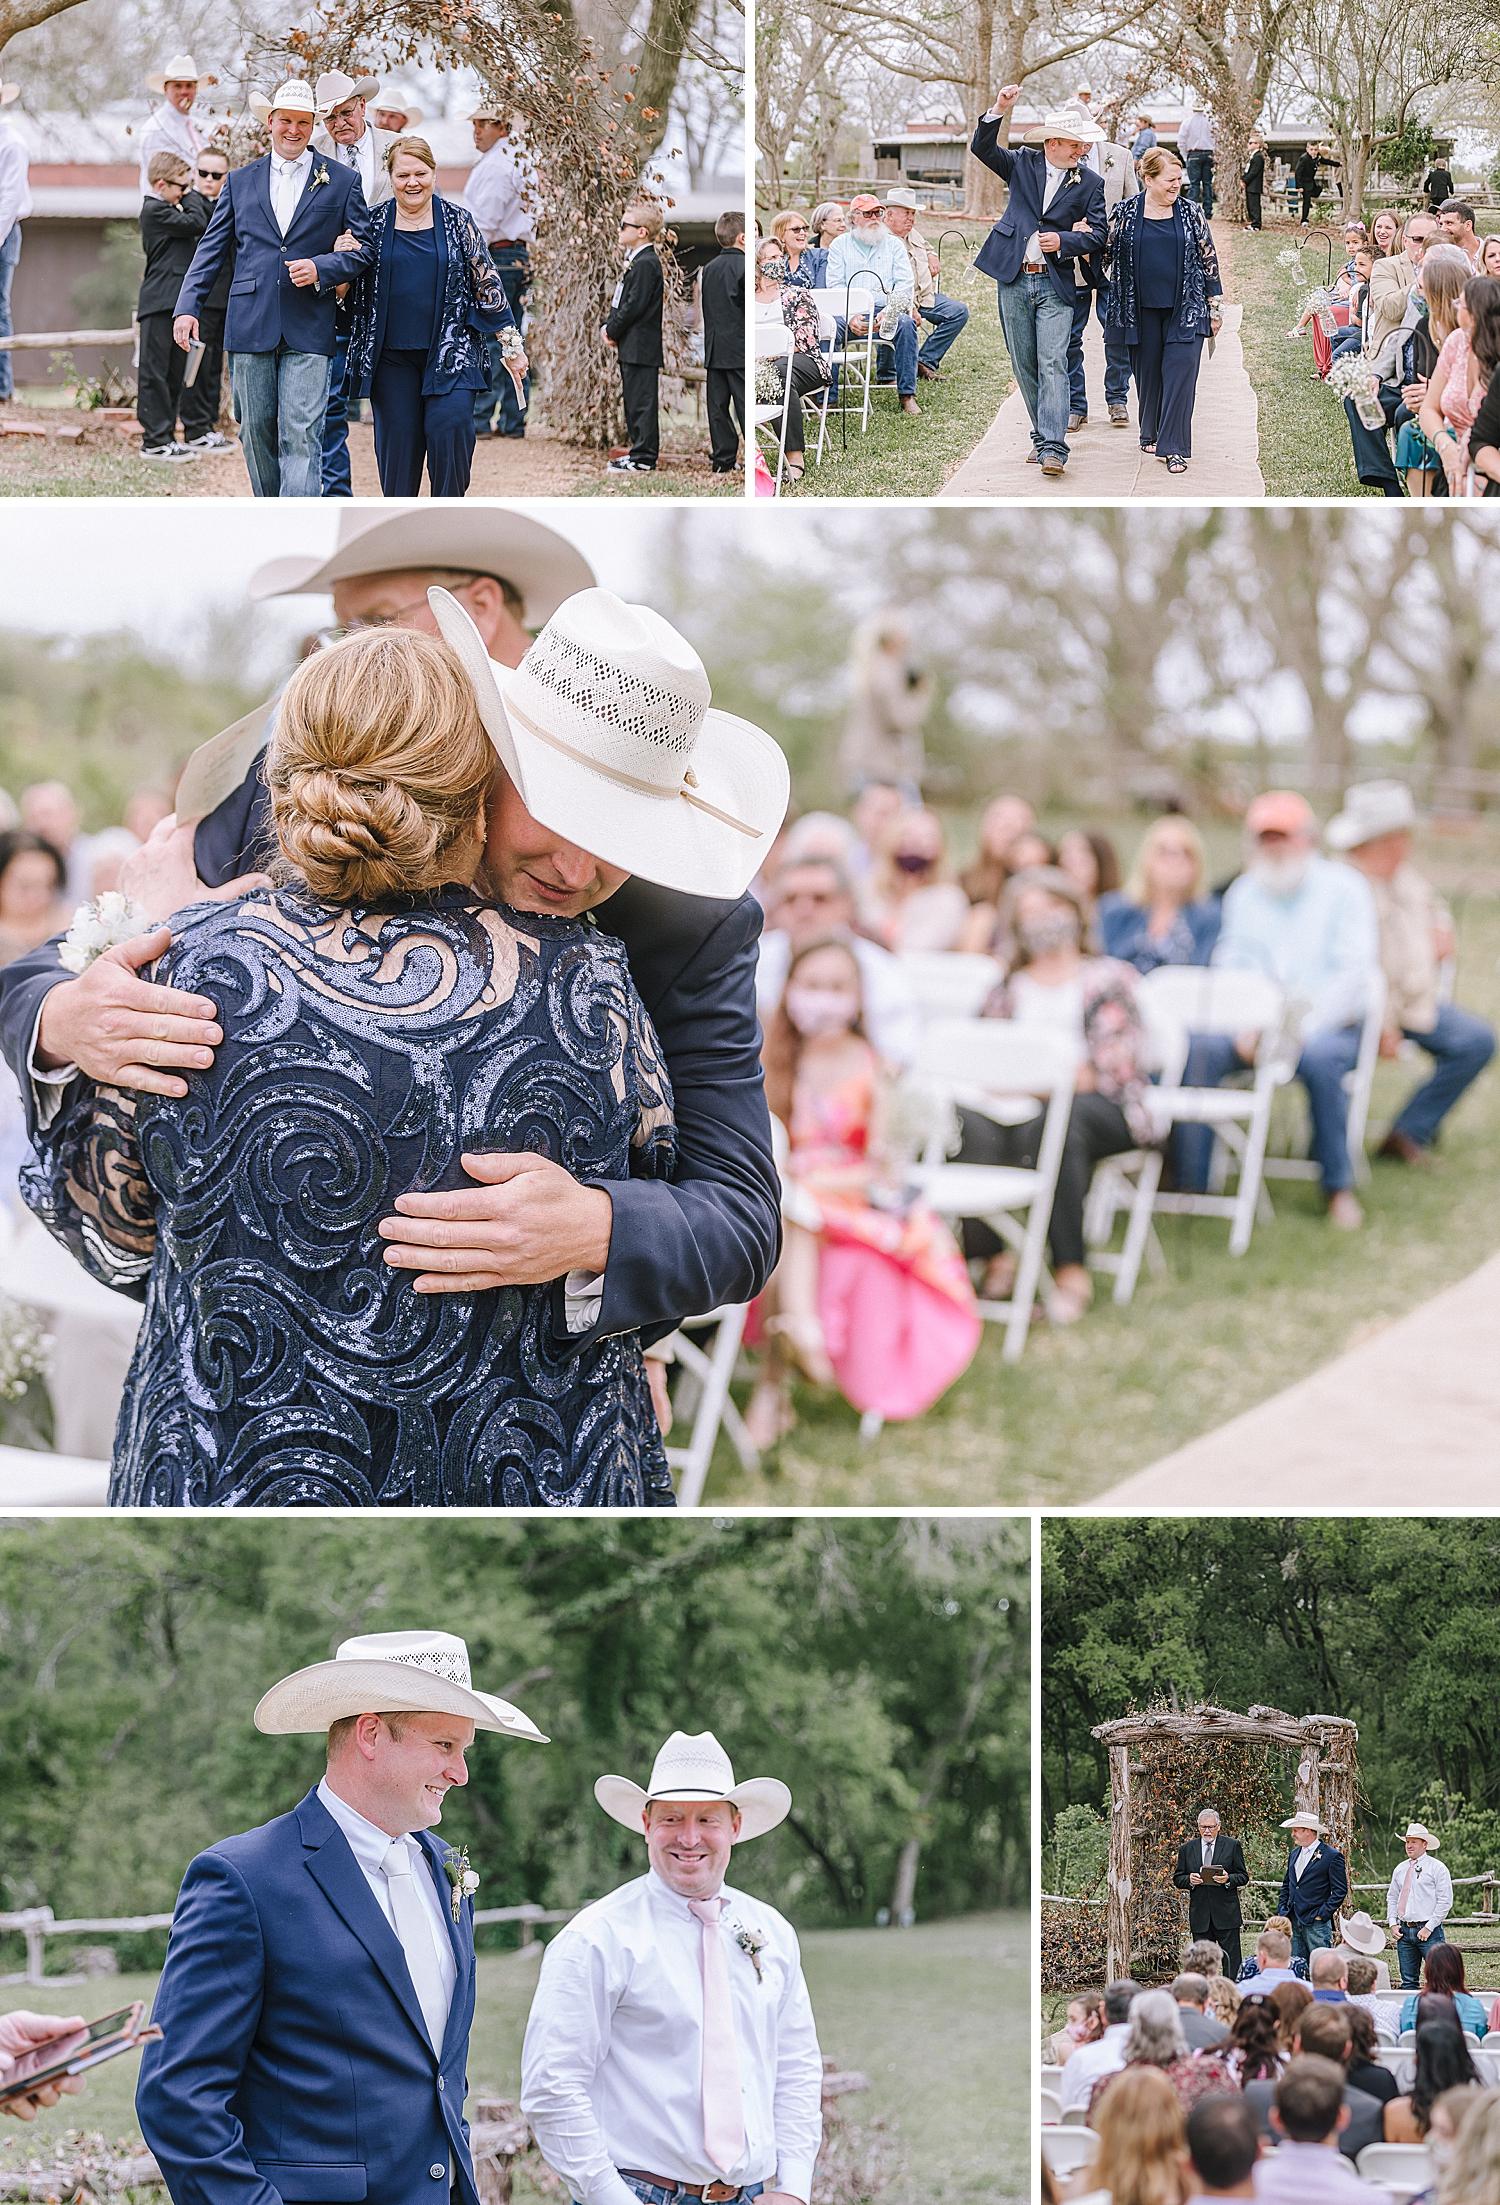 Rio-Cibilo-Ranch-Marion-Texas-Wedding-Rustic-Blush-Rose-Quartz-Details-Carly-Barton-Photography_0033.jpg